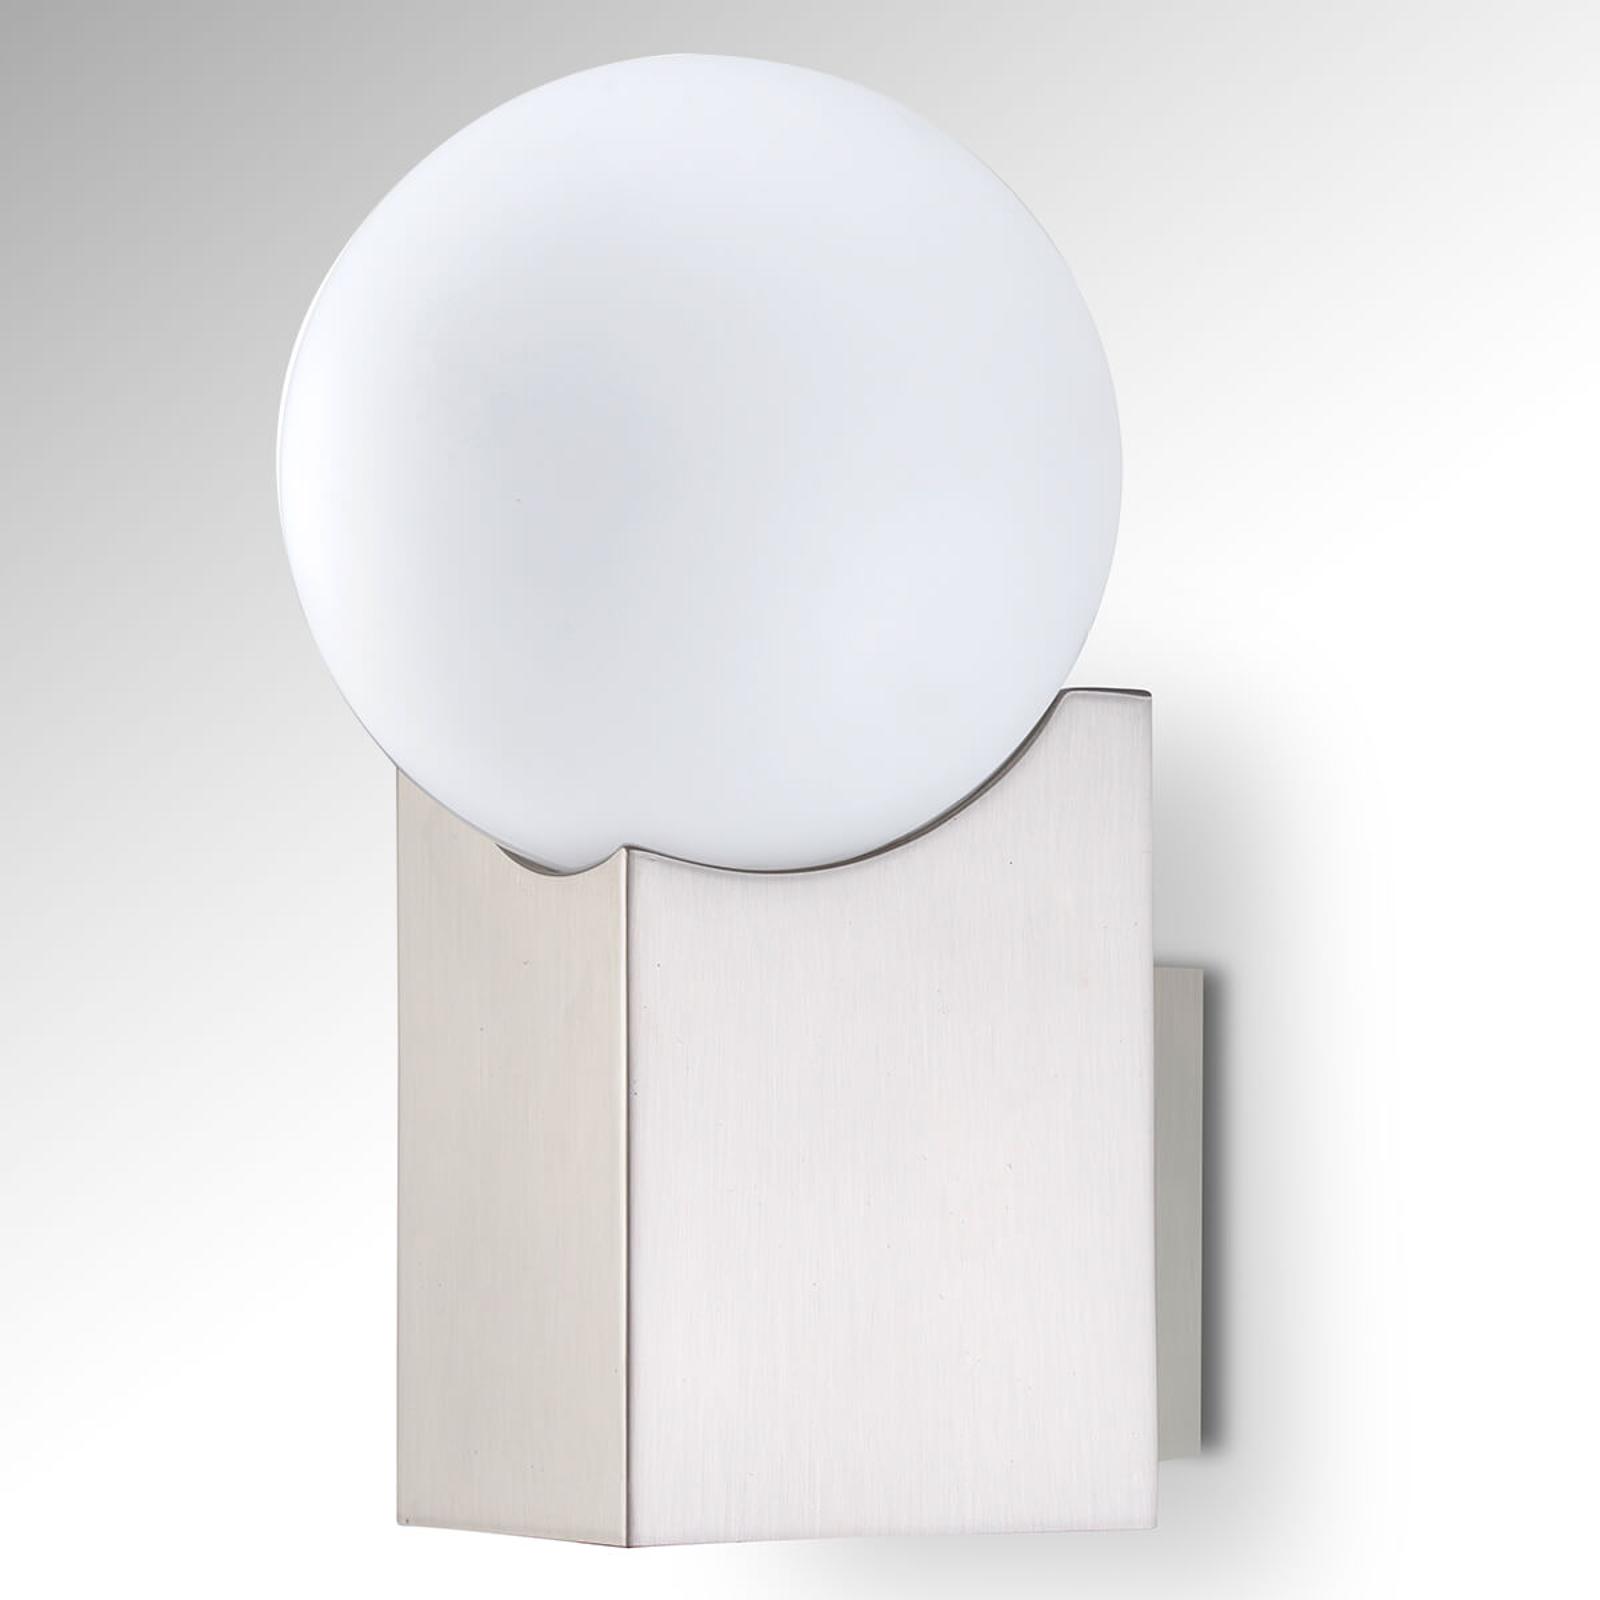 Vegglampe Cub nikkel matt